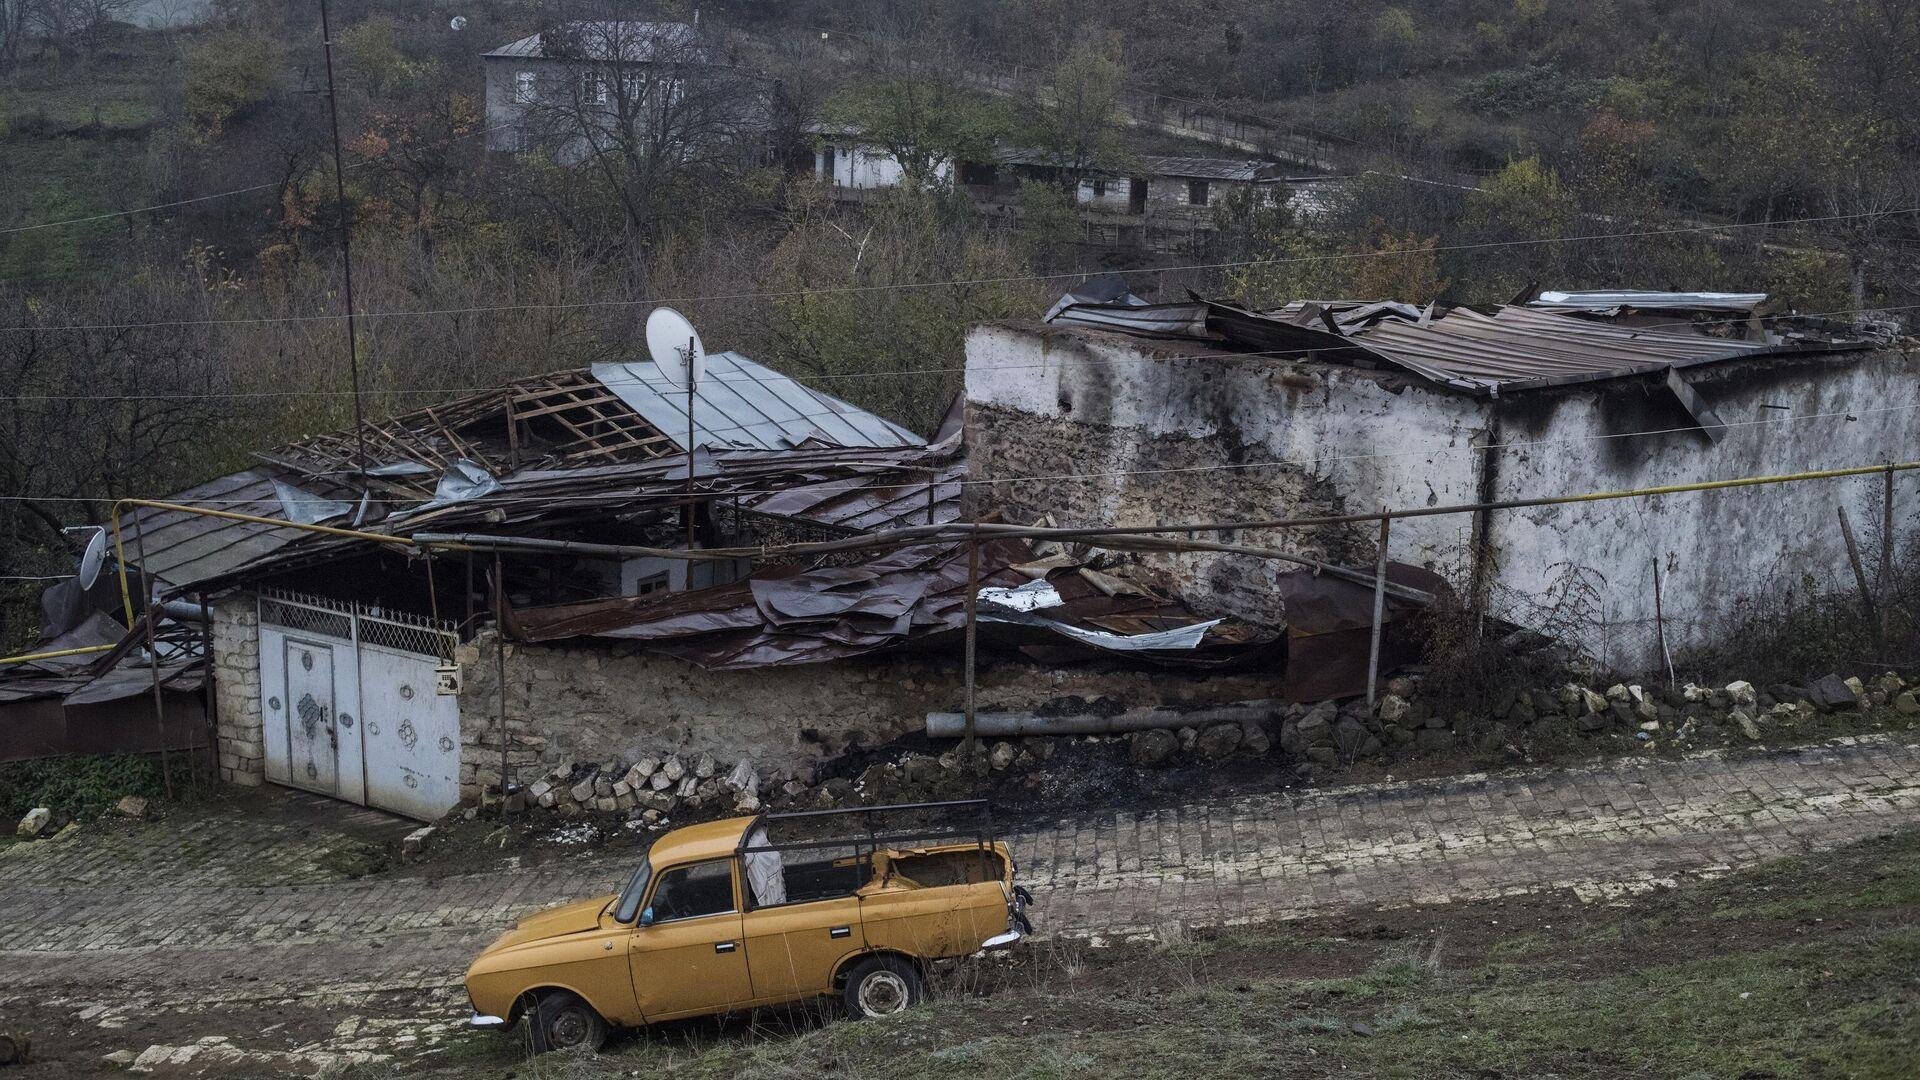 Вид на дома в селе Мачкалашен Мартунинского района в Нагорном Карабахе - РИА Новости, 1920, 04.12.2020